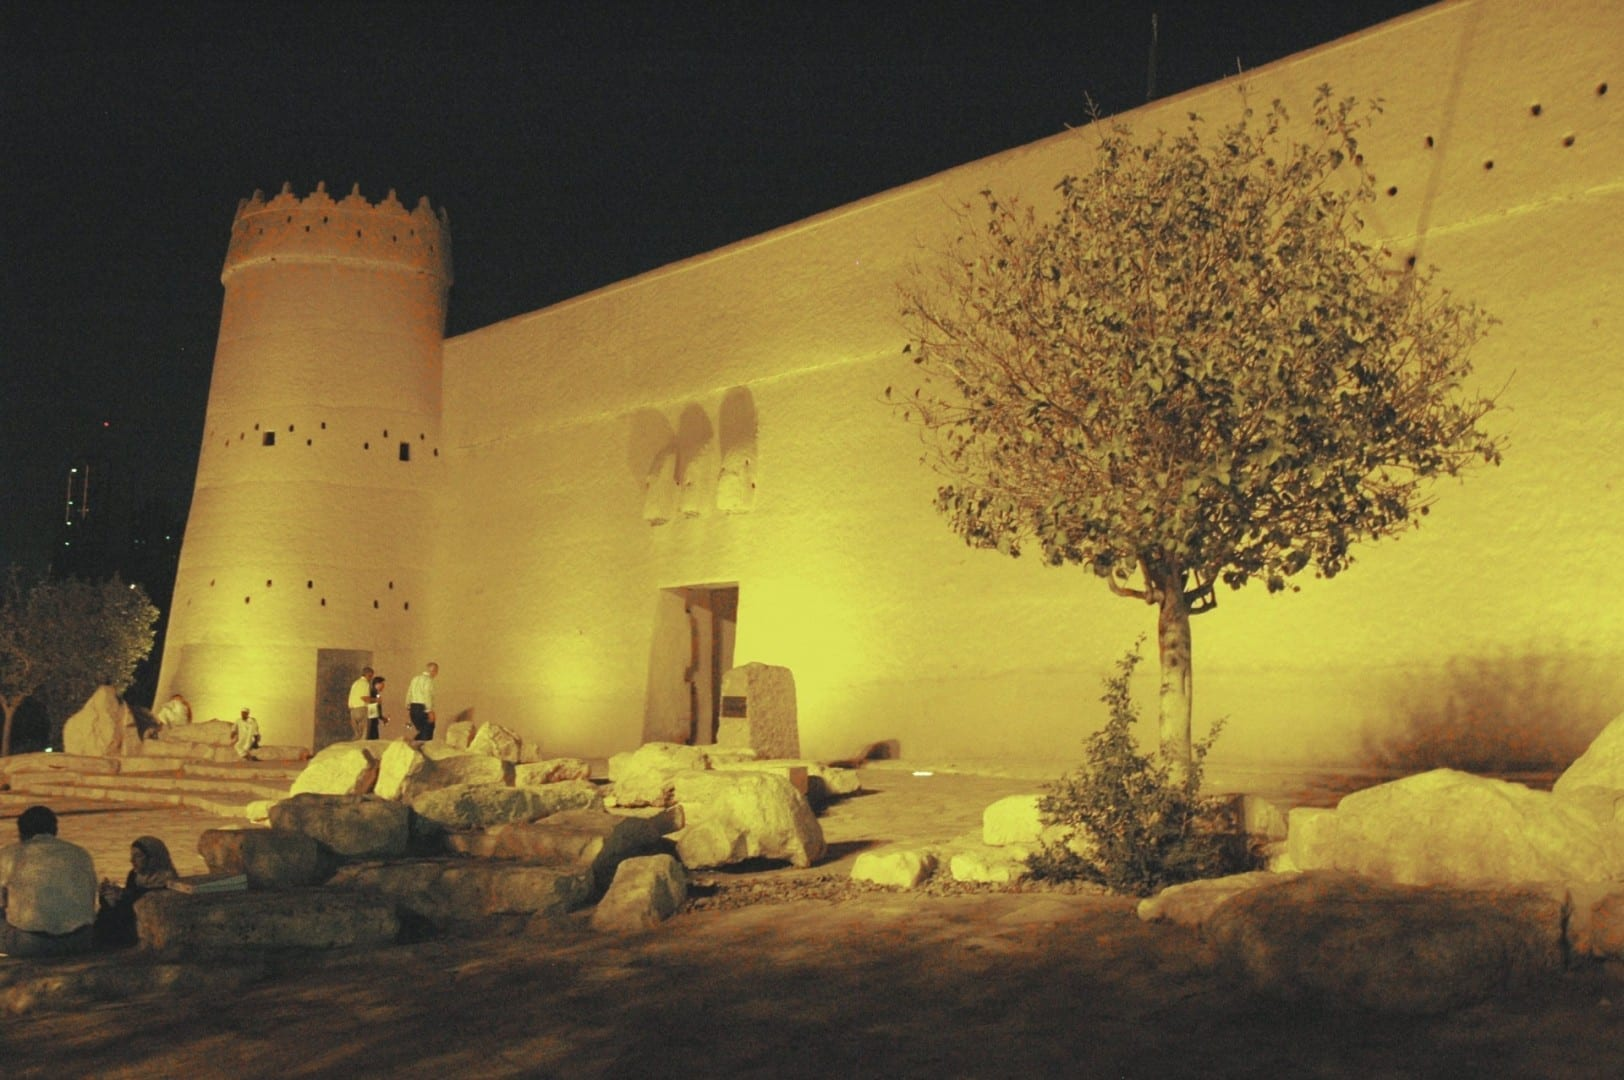 La Fortaleza de Masmak iluminada por la noche Riyadh Arabia Saudí